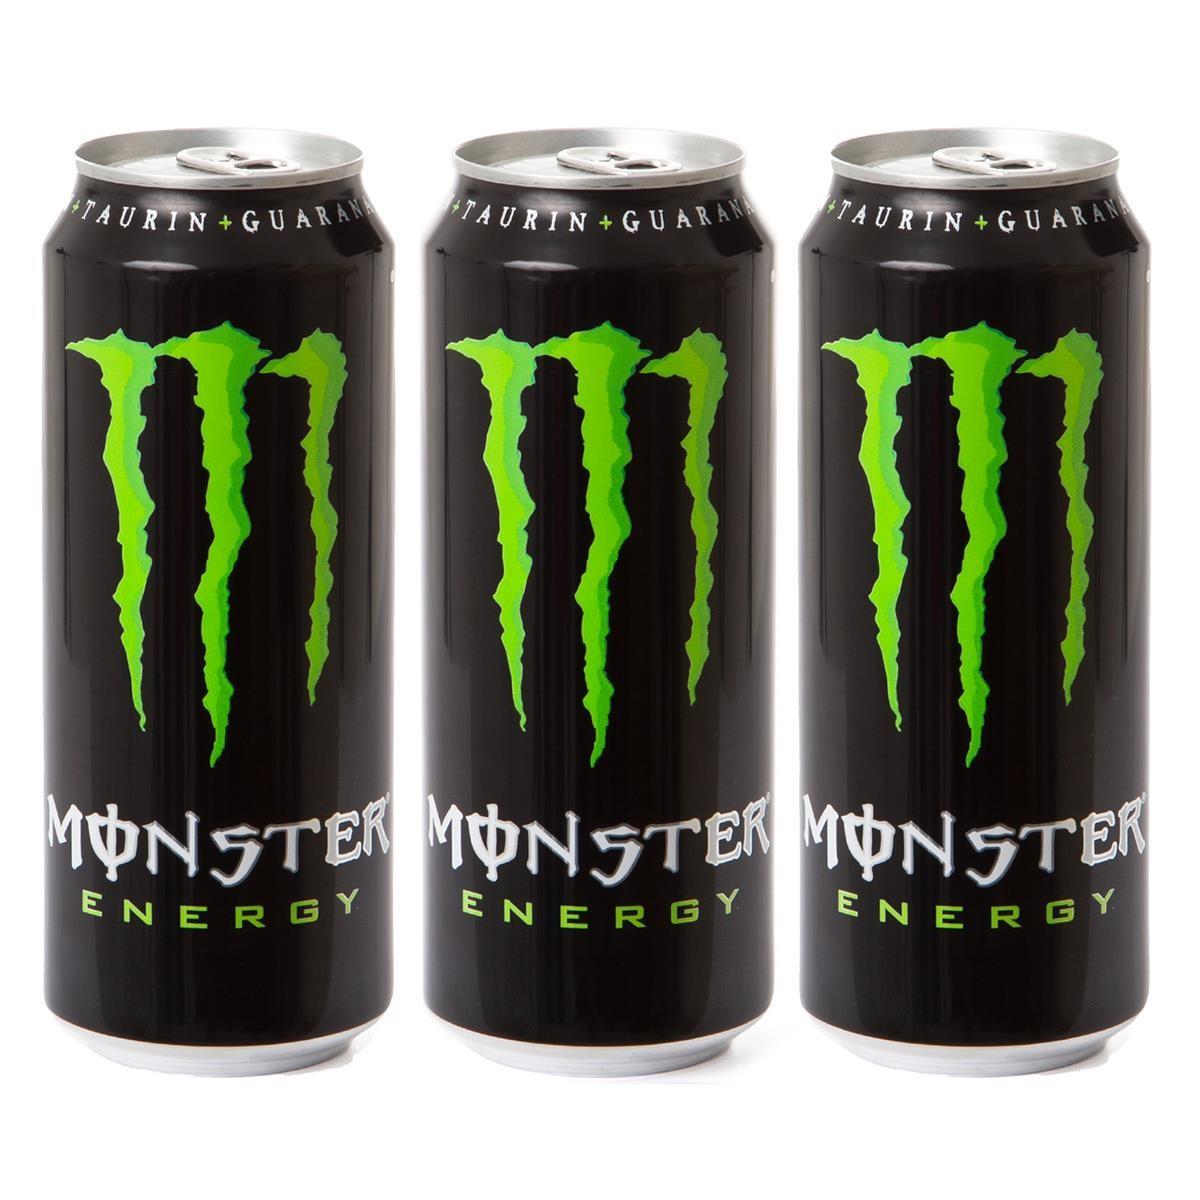 20 Best Monster Energy Aufkleber About Zenfone 5